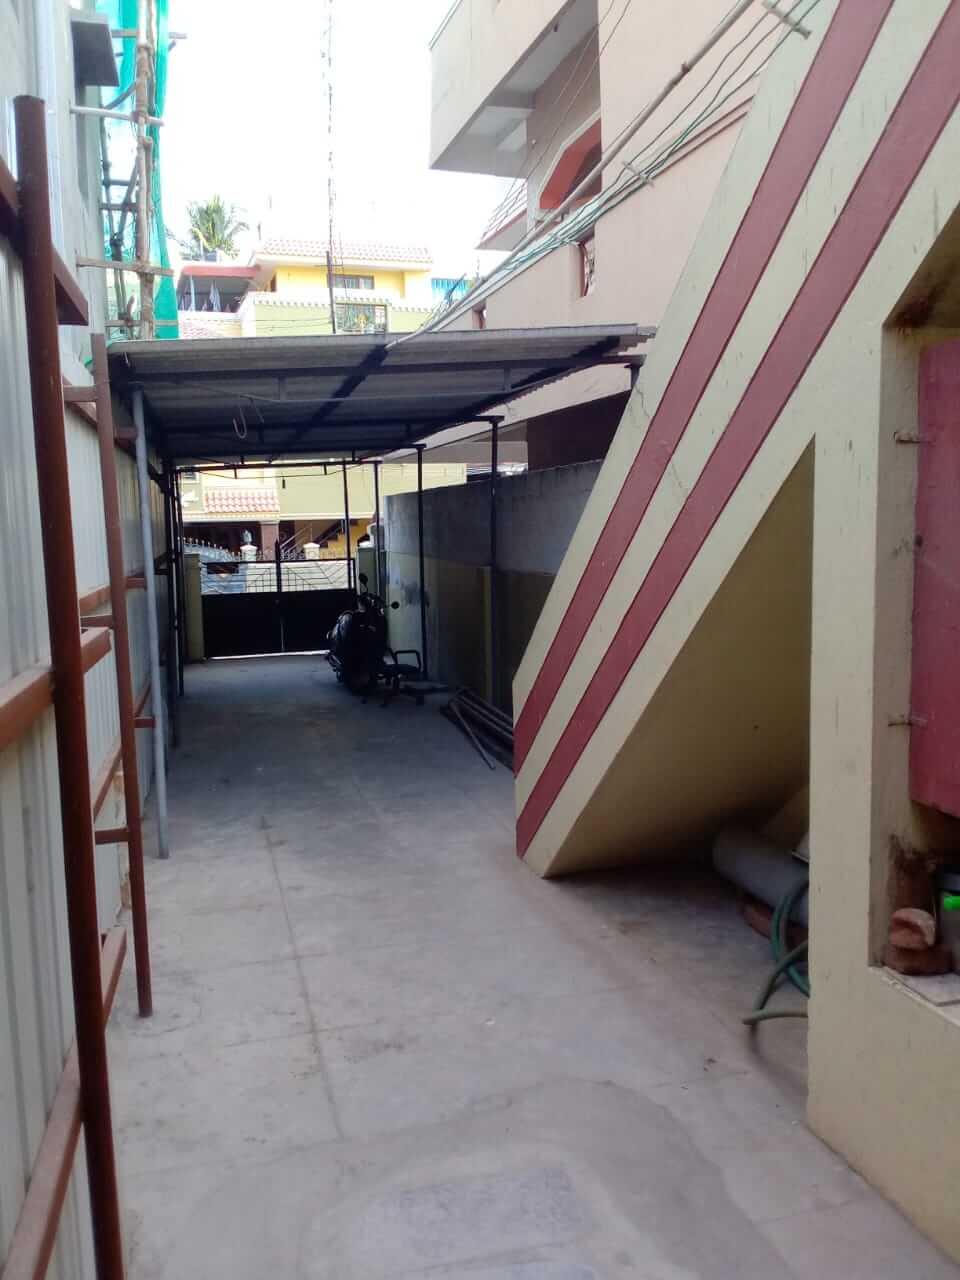 Warehouse / Godown for Rent 1100 Sq. Feet at Coimbatore, Siva Nanda Colony